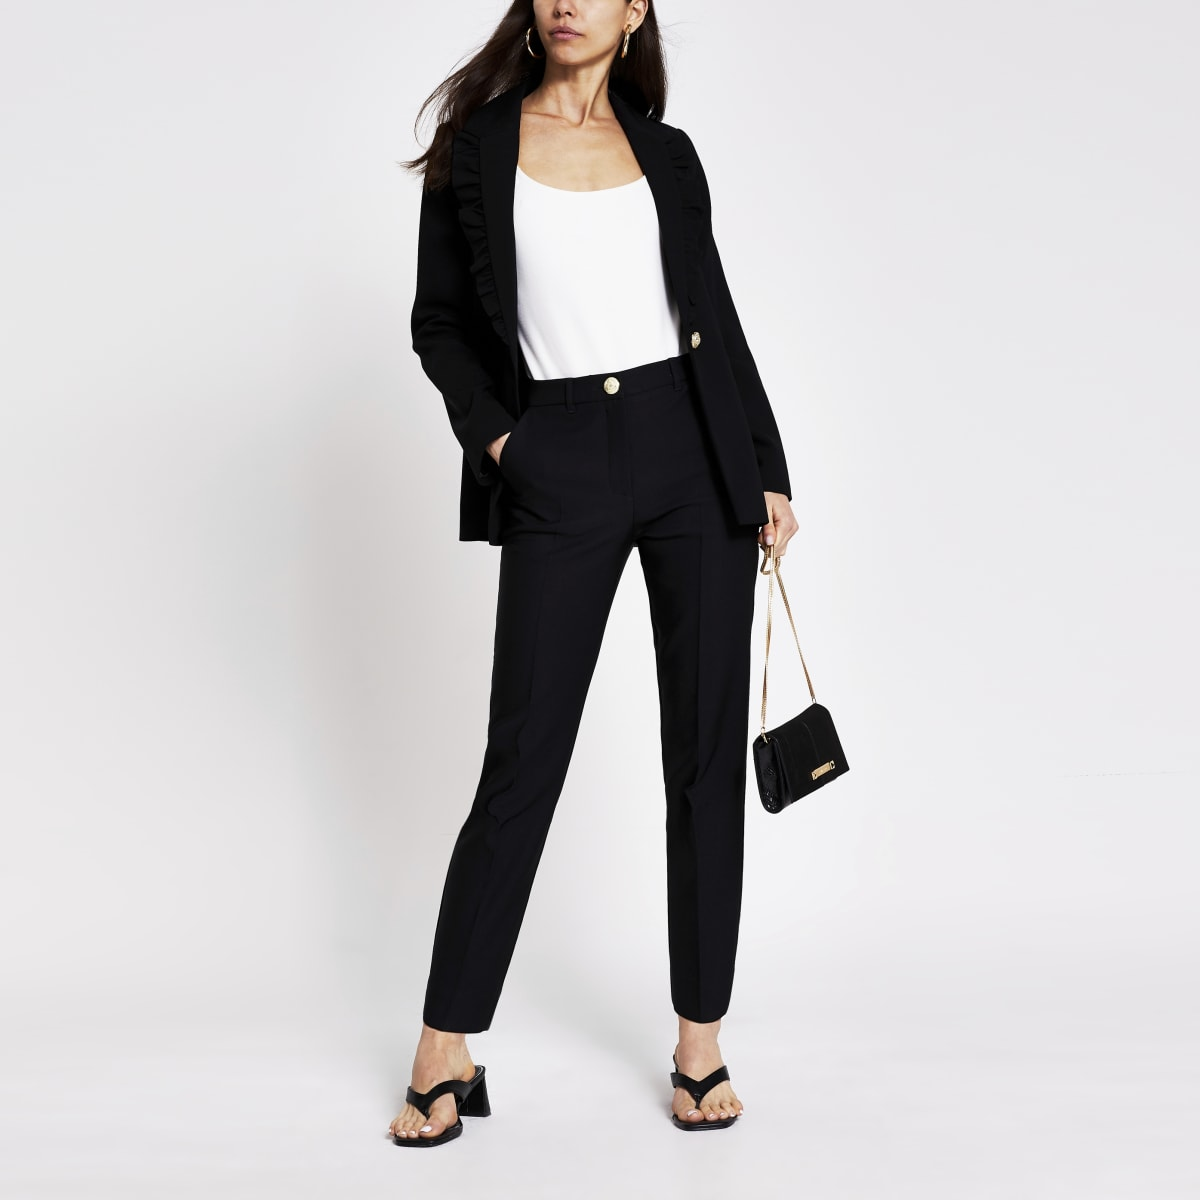 Black clove cigarette trouser